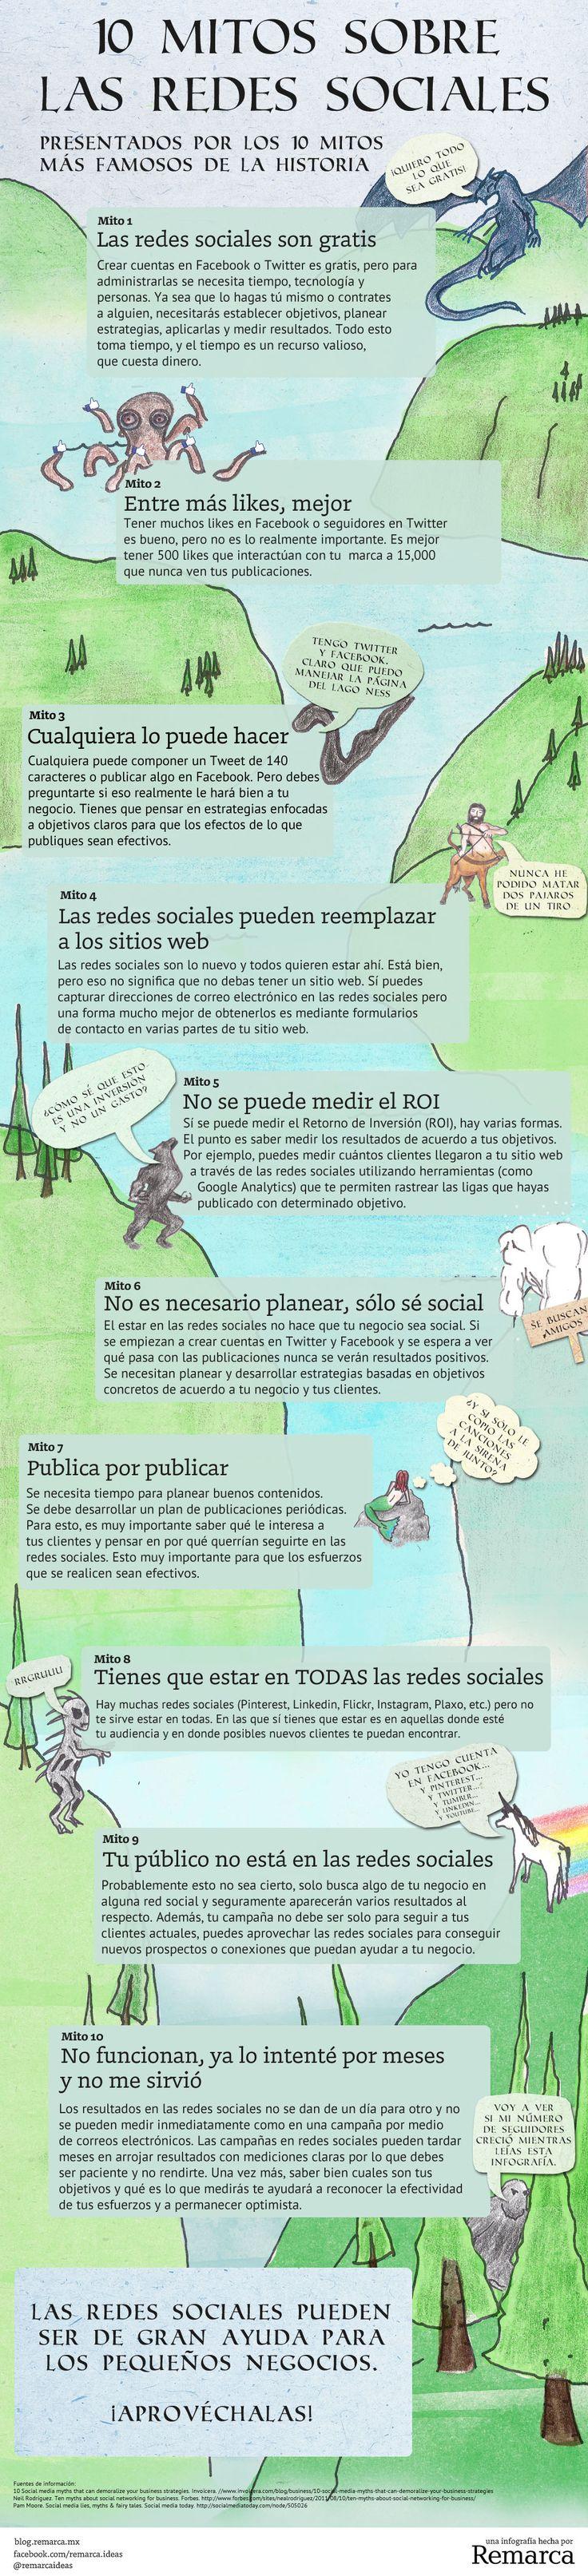 Mitos de la mercadotecnia en redes sociales http://giovannibenavides.com/the_creator/